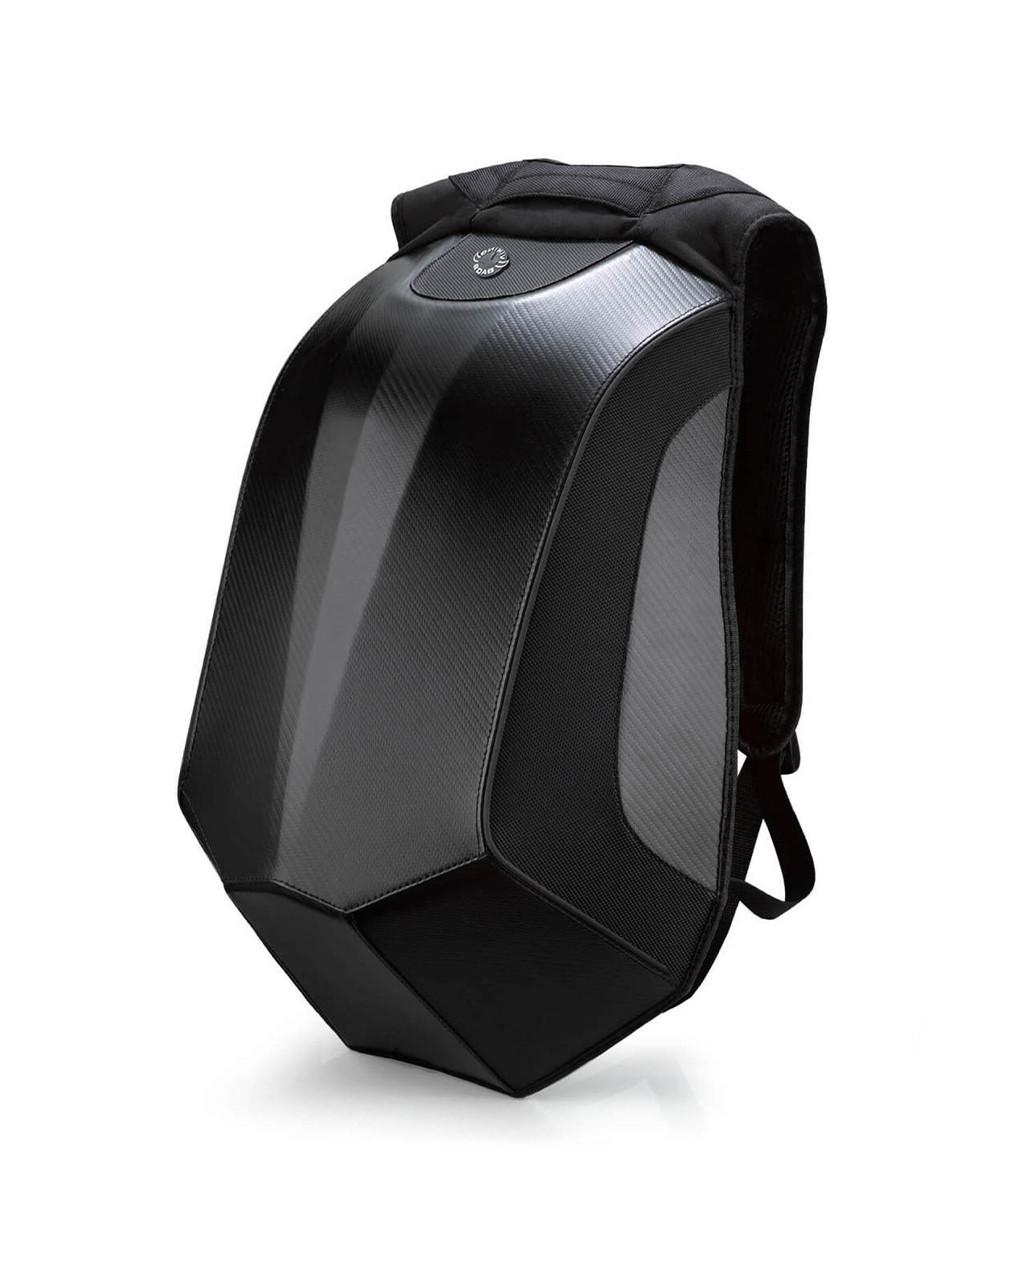 Viking Velocity Large Black Street/Sportbike Backpack Main Bag View